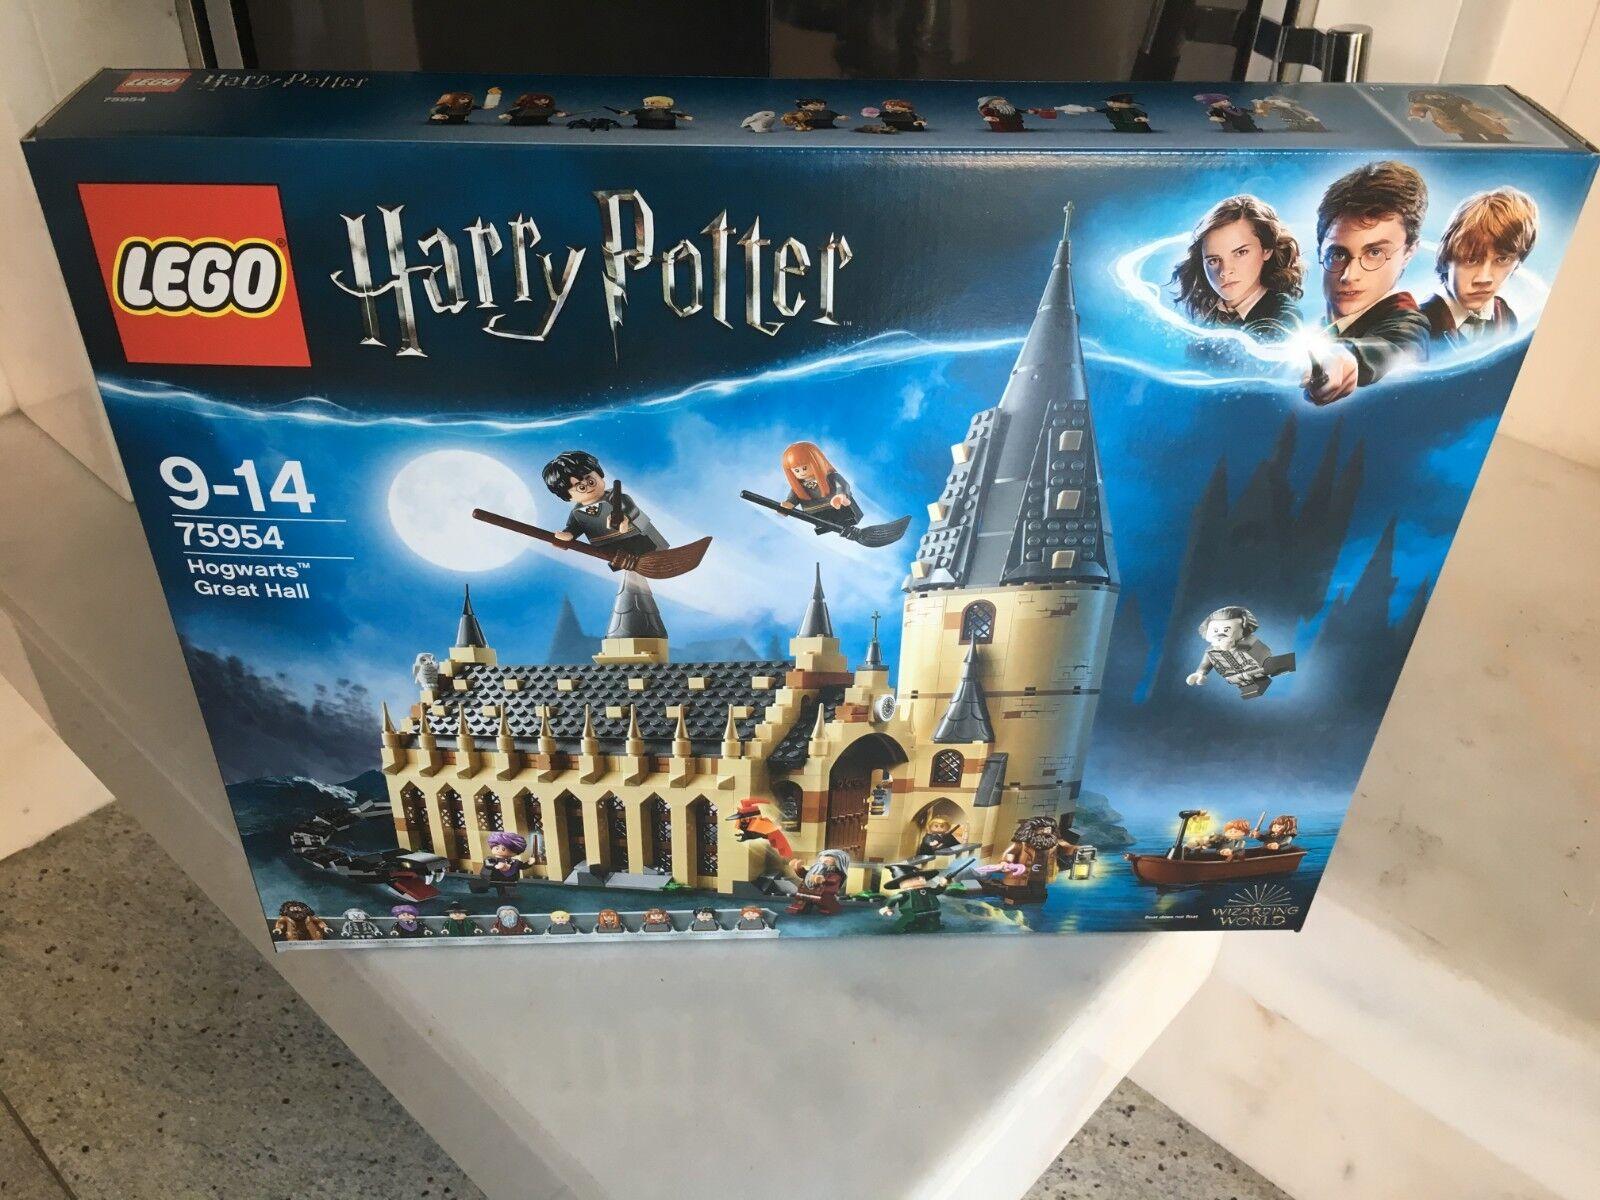 Lego Harry Potter 75954 gran sala de castillo Hogwarts OVP 835 piezas